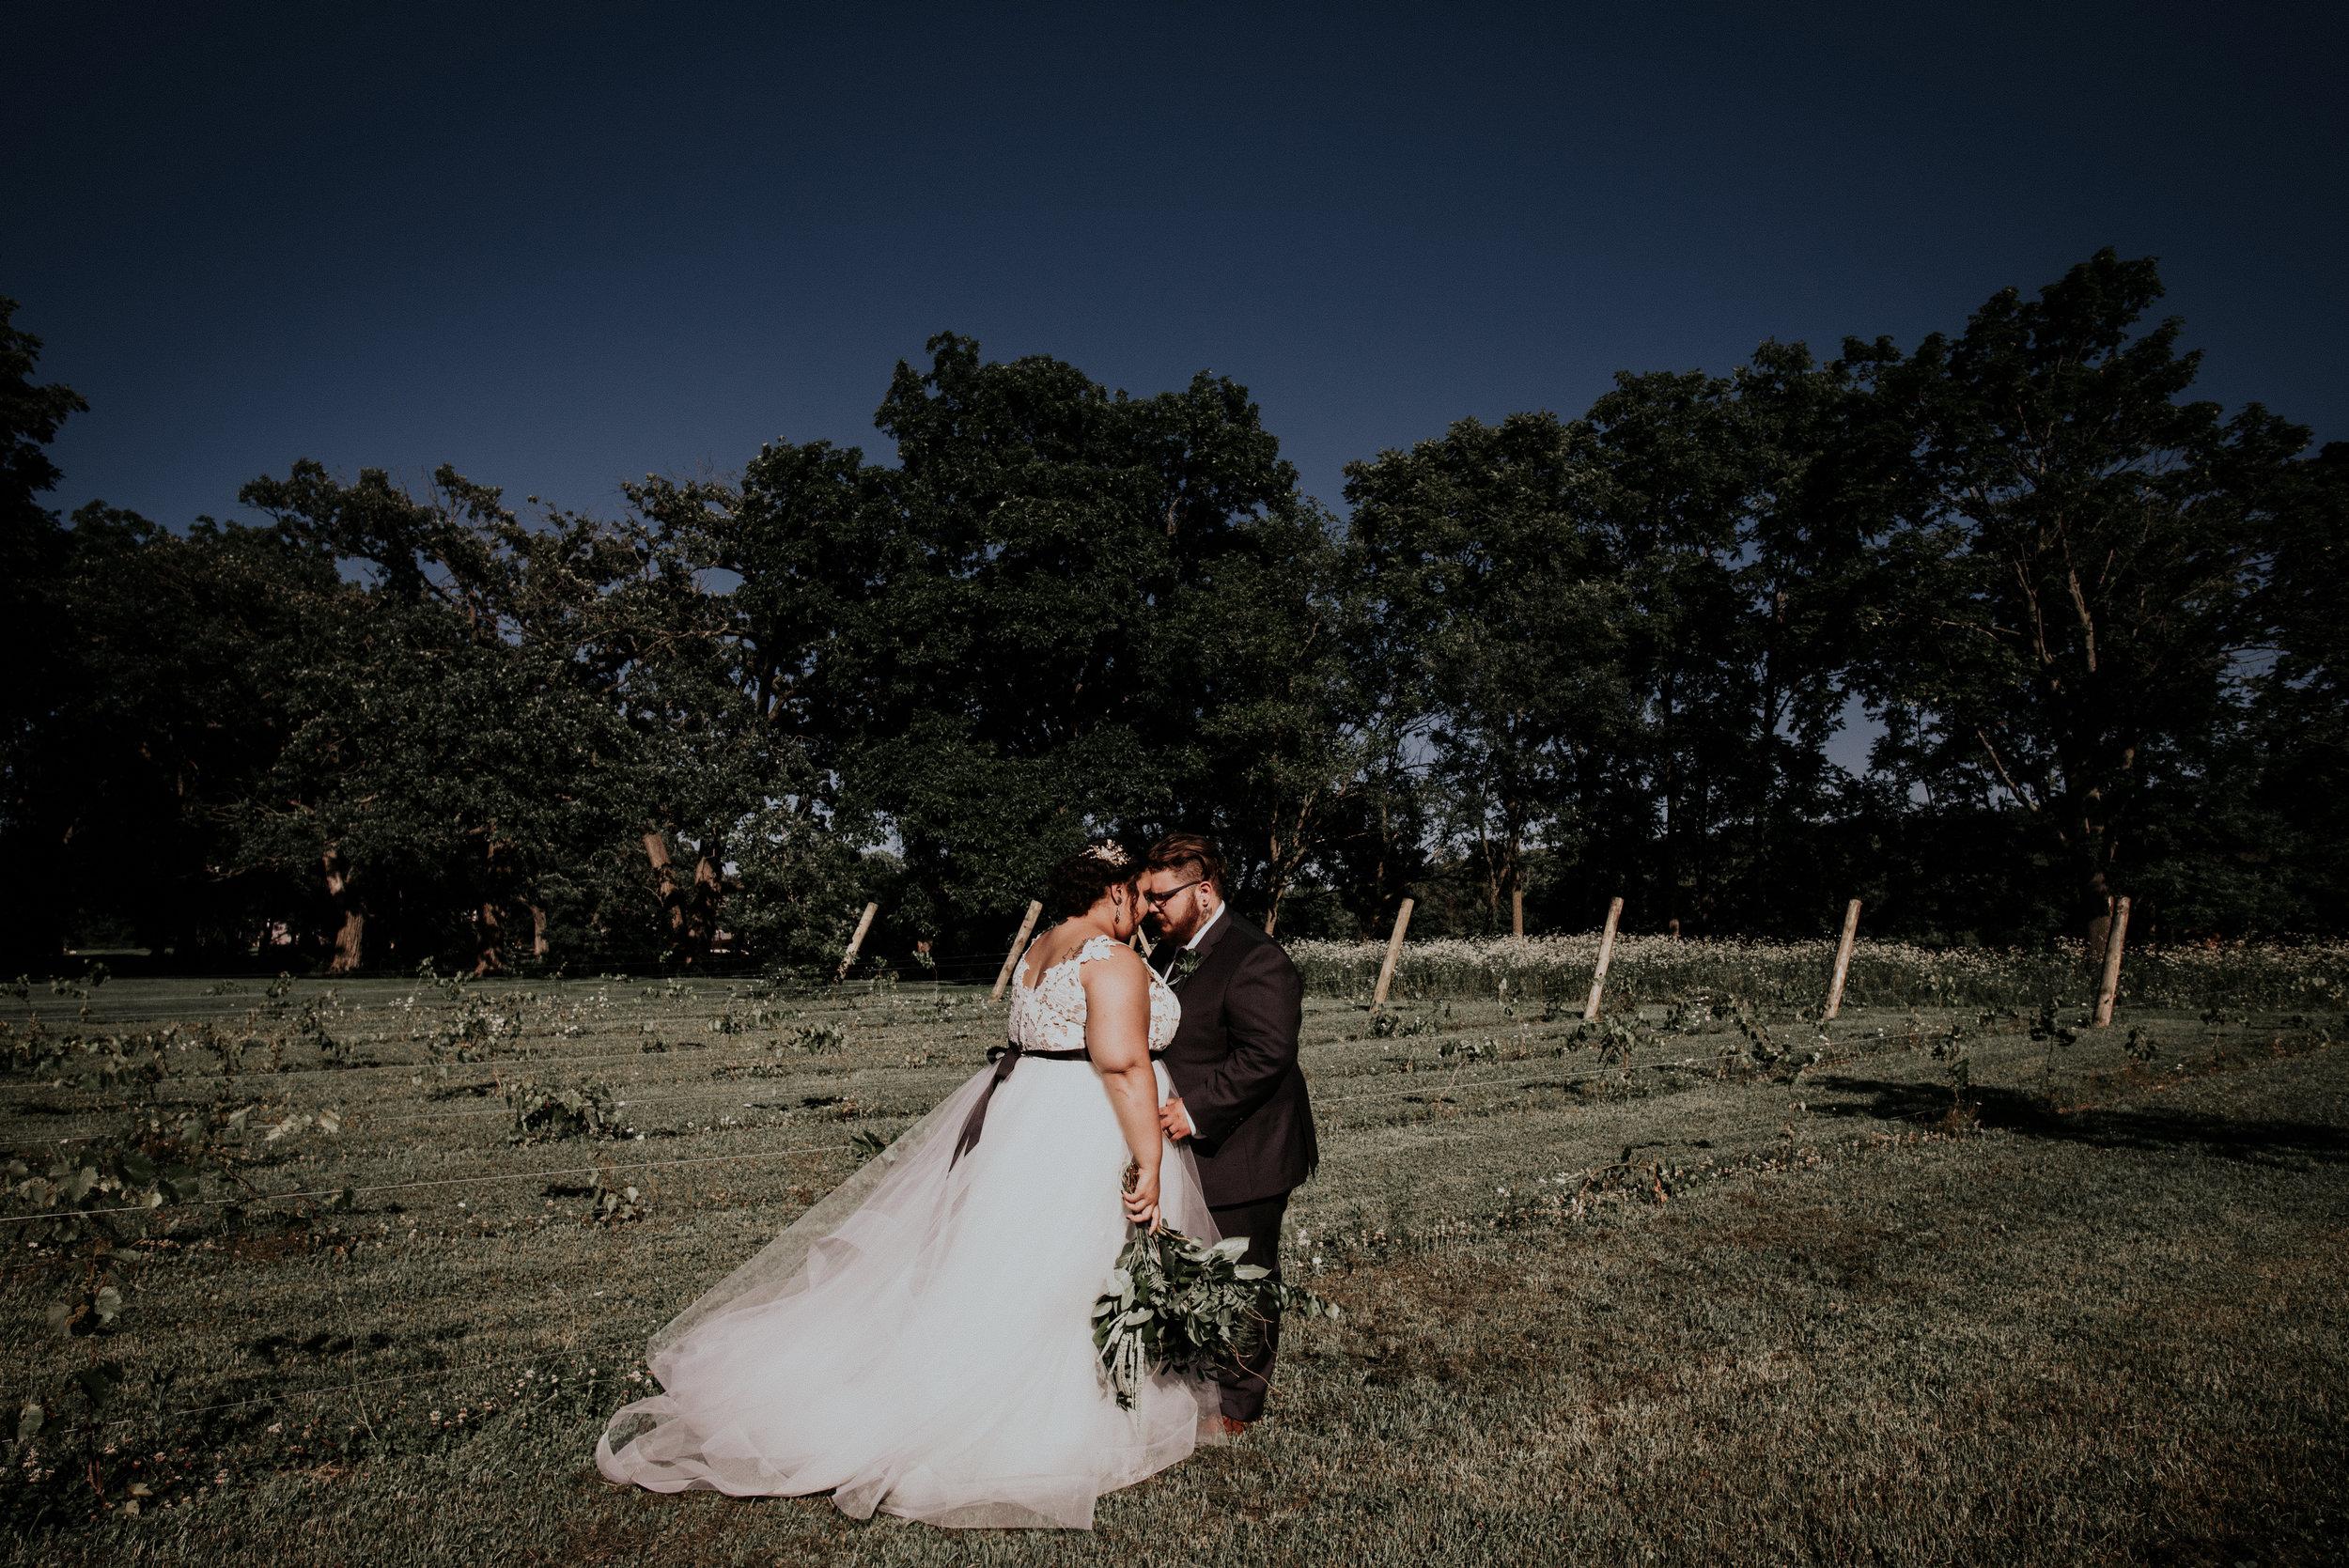 BridesbyYoung-RealWedding-PlusSizeBridal-BillyCourtney-JurassicParkTheme-42.jpg